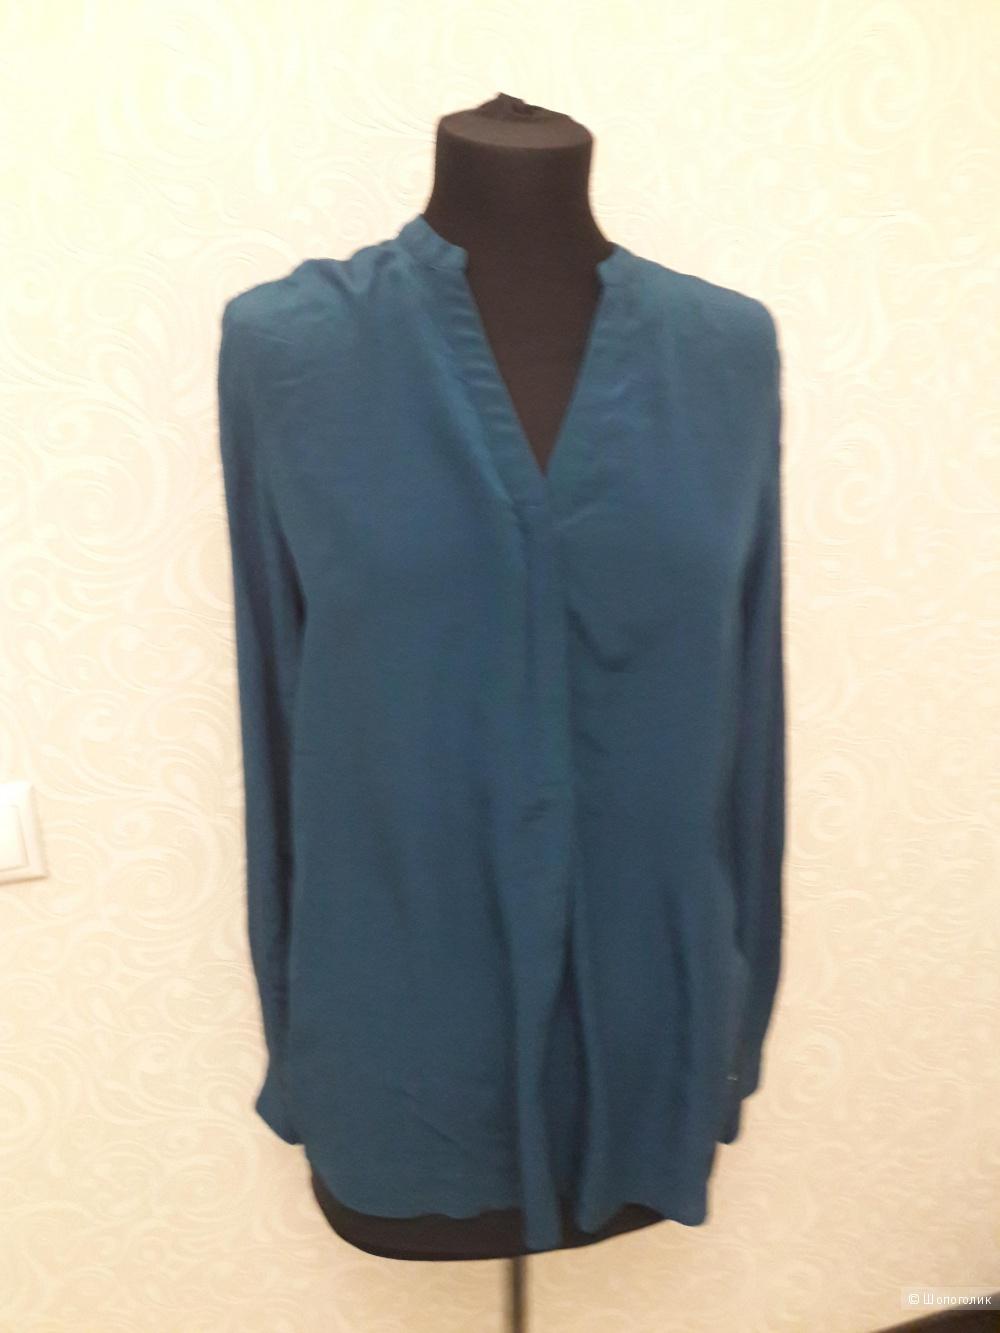 TOMMY HILFIGER: шелковая блузка, классика, 8